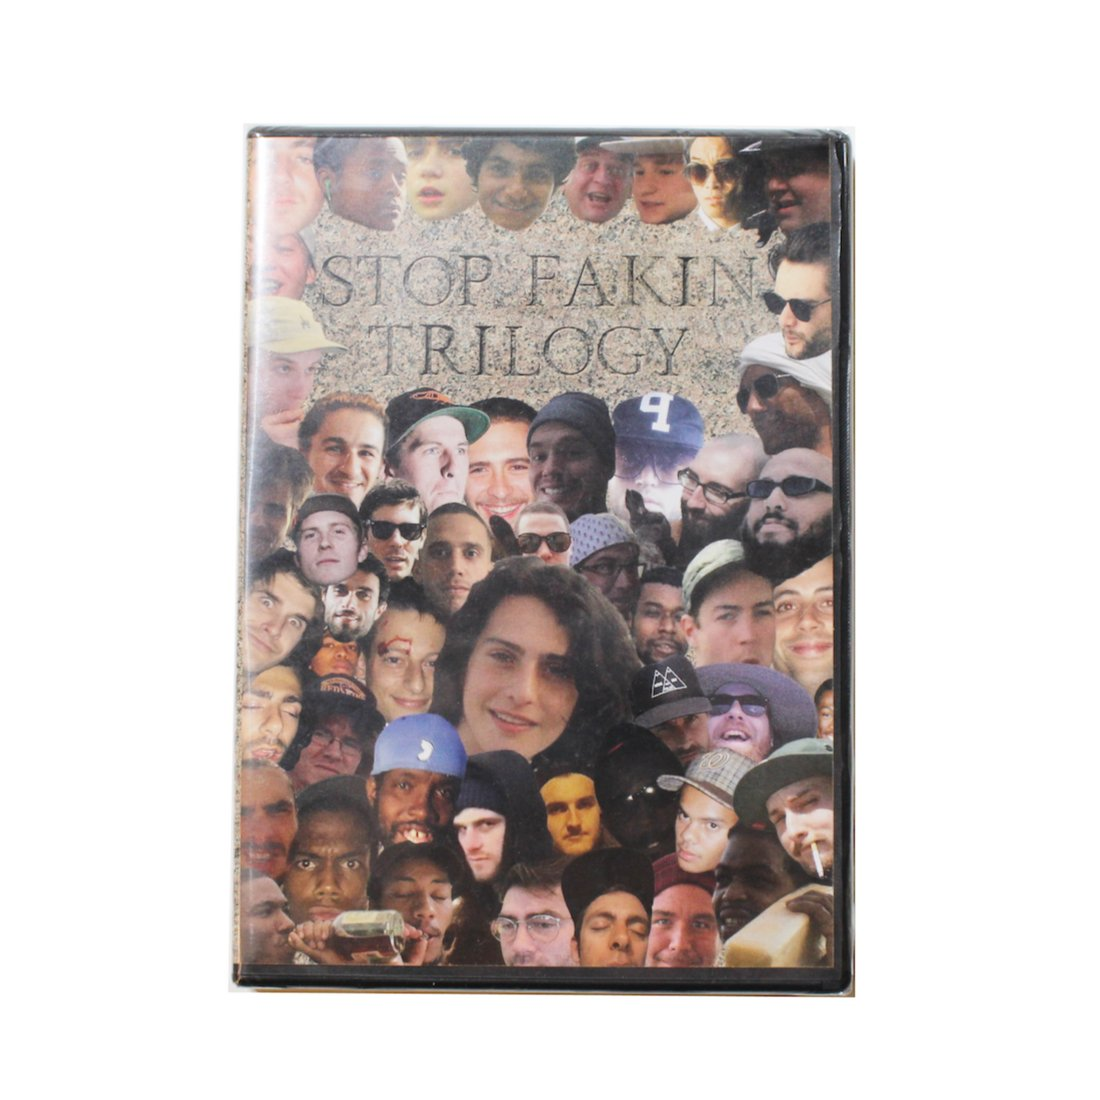 【STOP FAKIN TRILOGY】- DVD